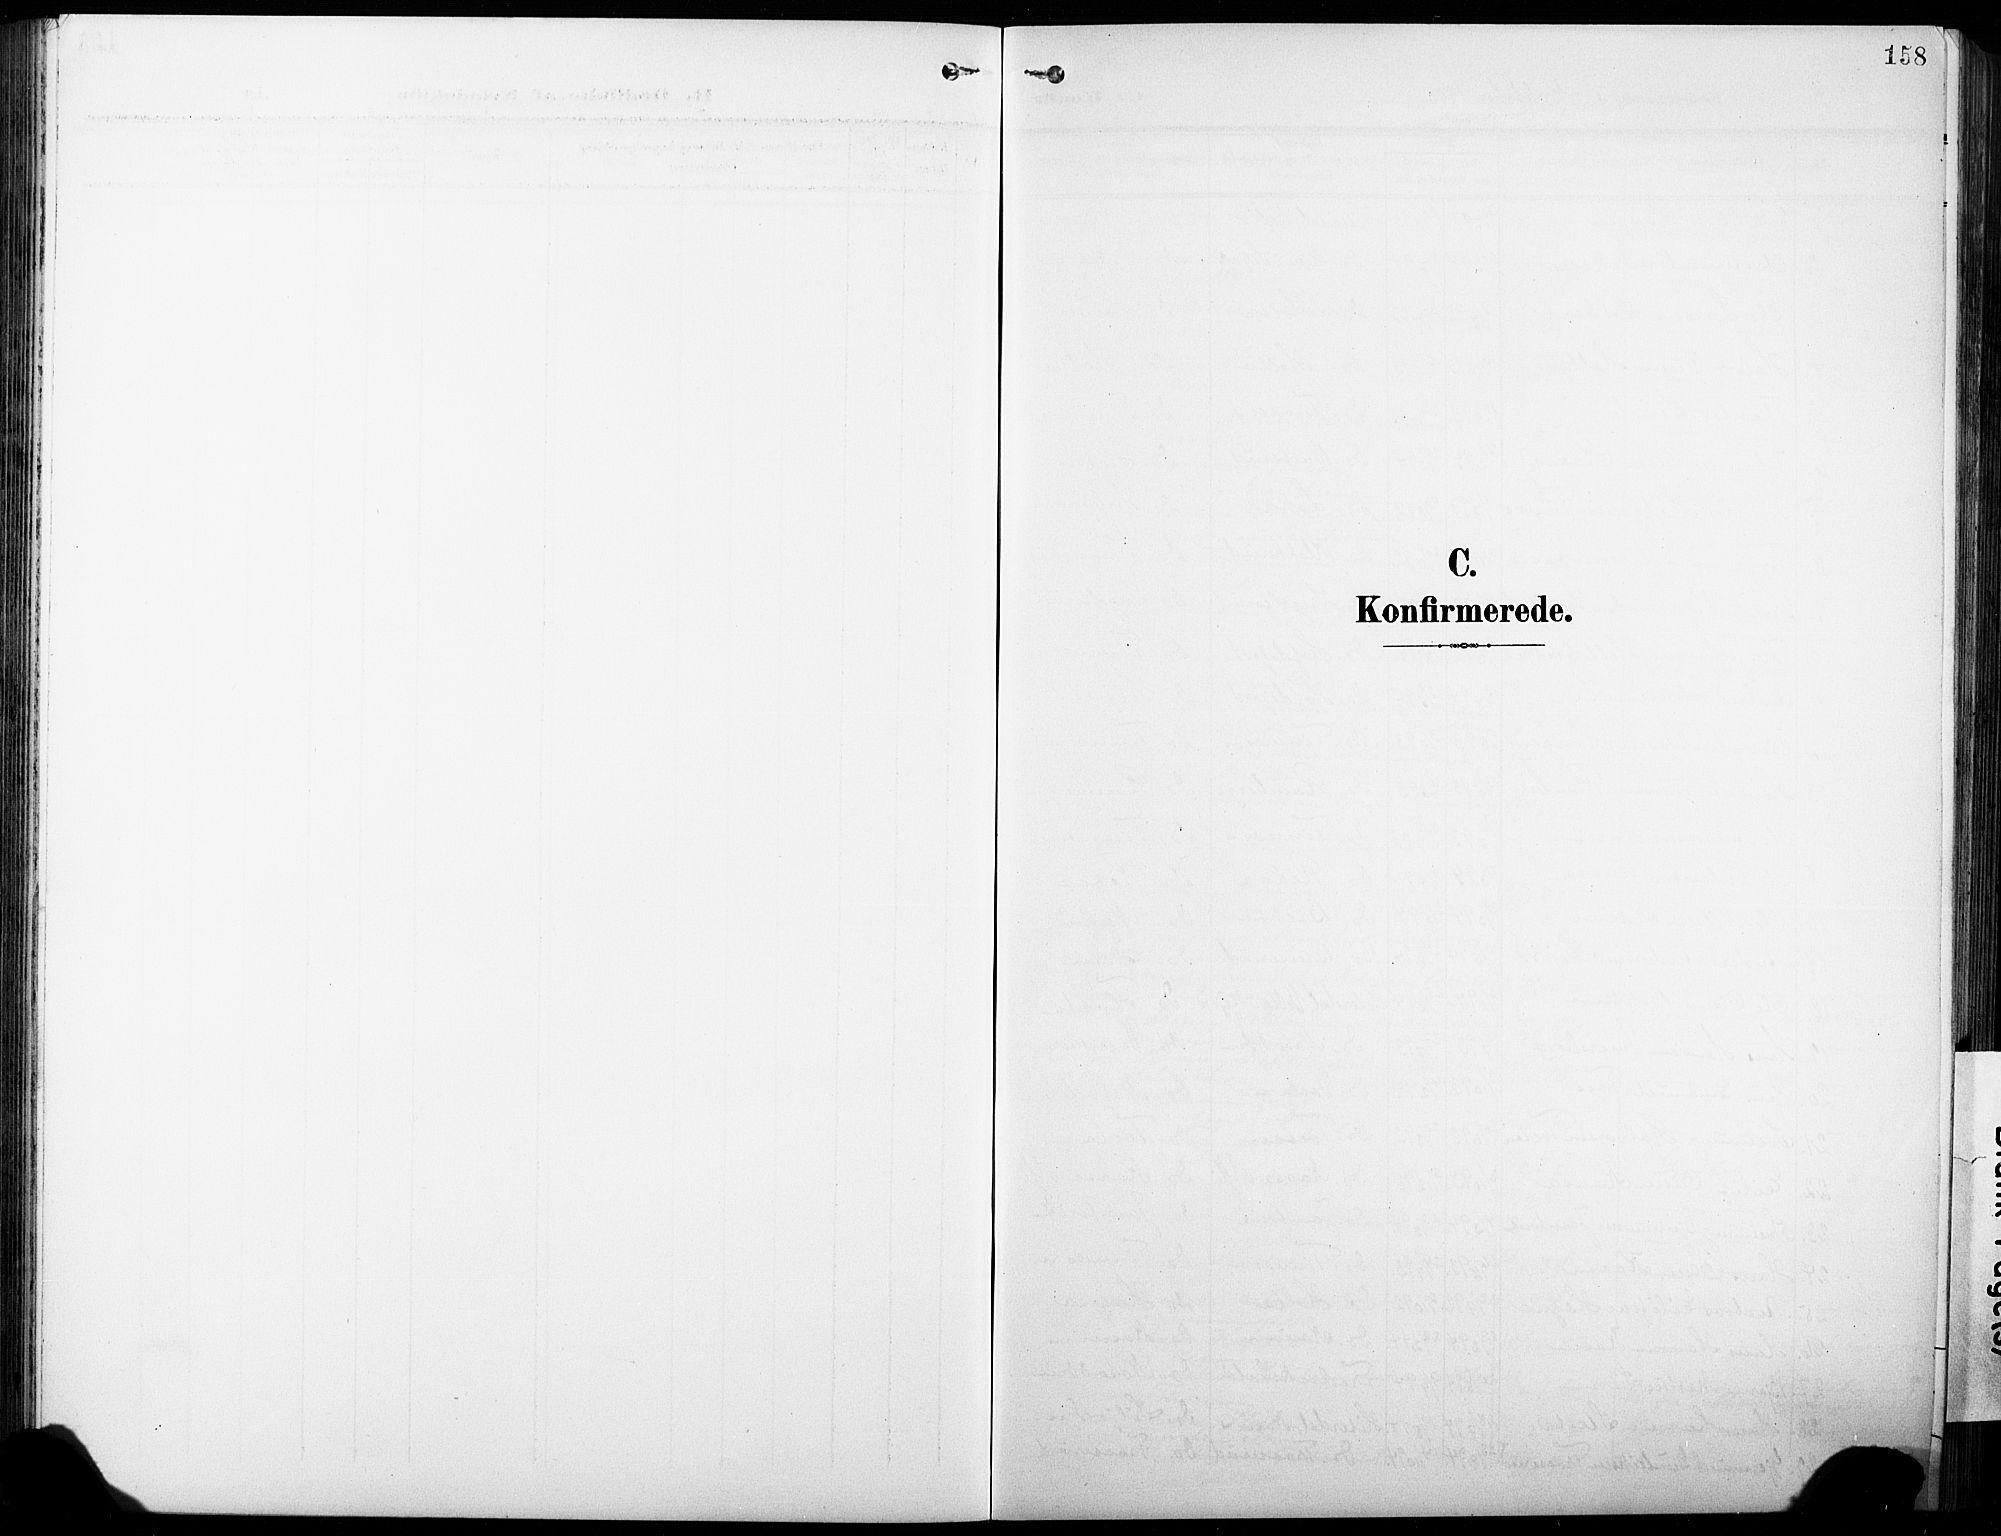 SAKO, Heddal kirkebøker, G/Ga/L0003: Klokkerbok nr. I 3, 1908-1932, s. 158